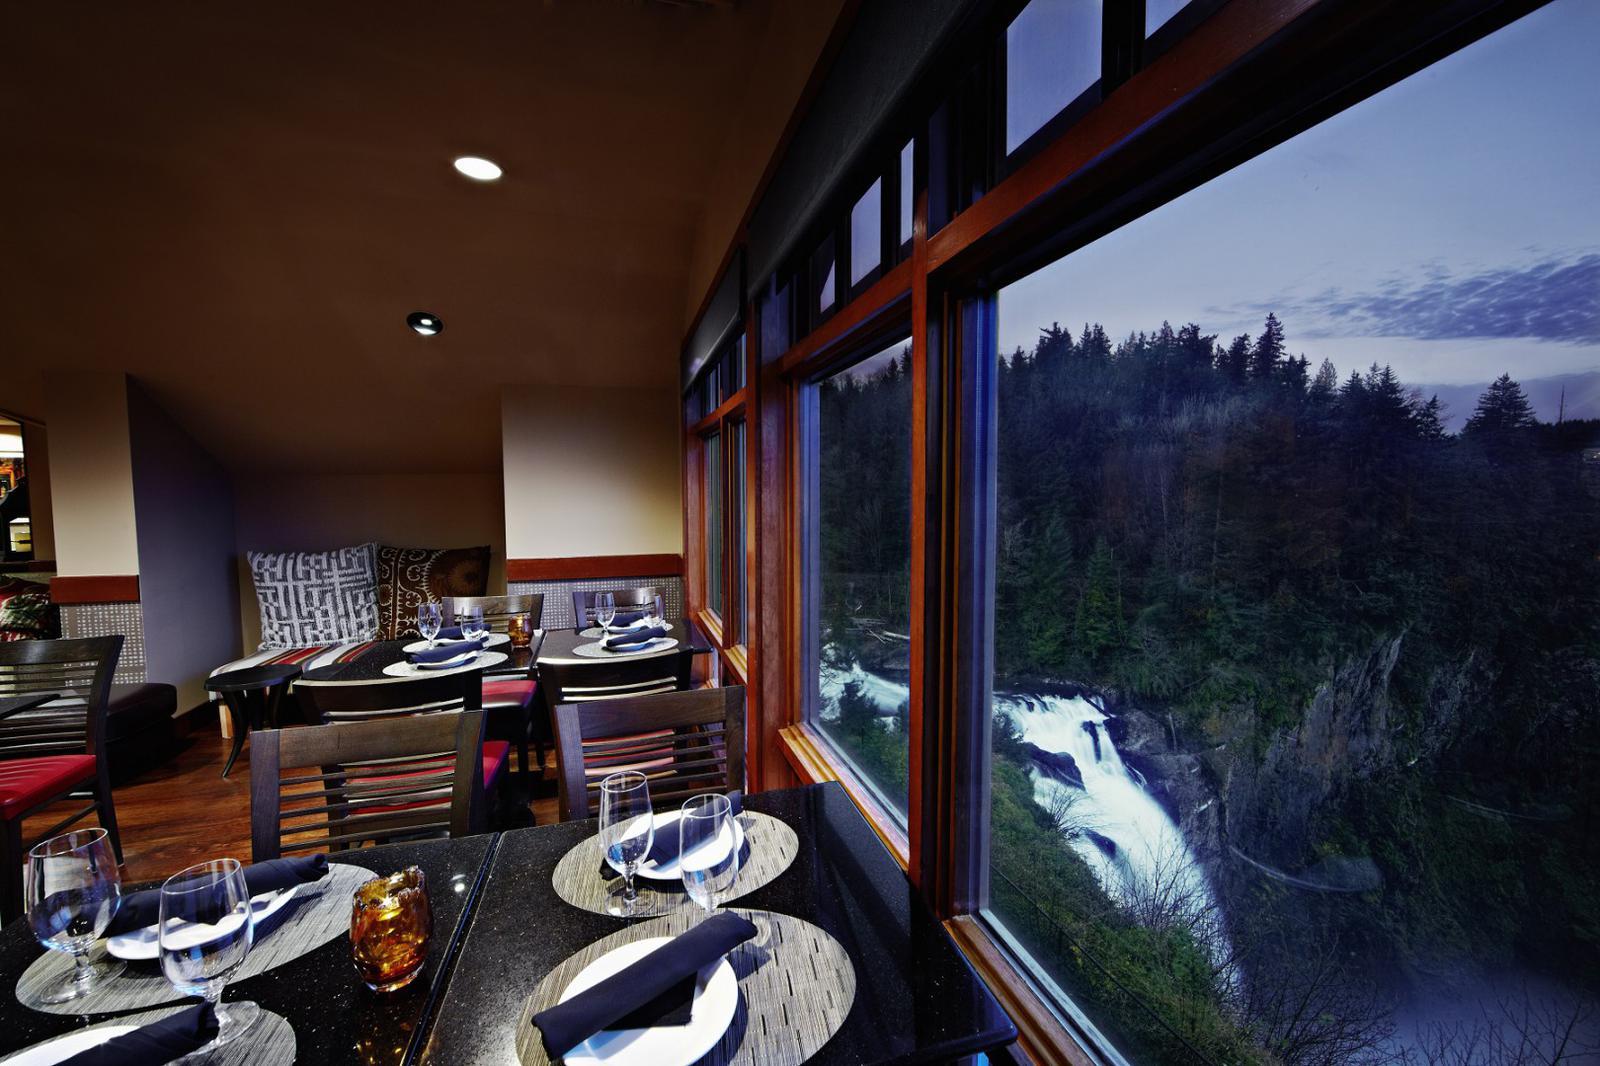 The Salish Lodge & Spa was the star of Twin Peaks